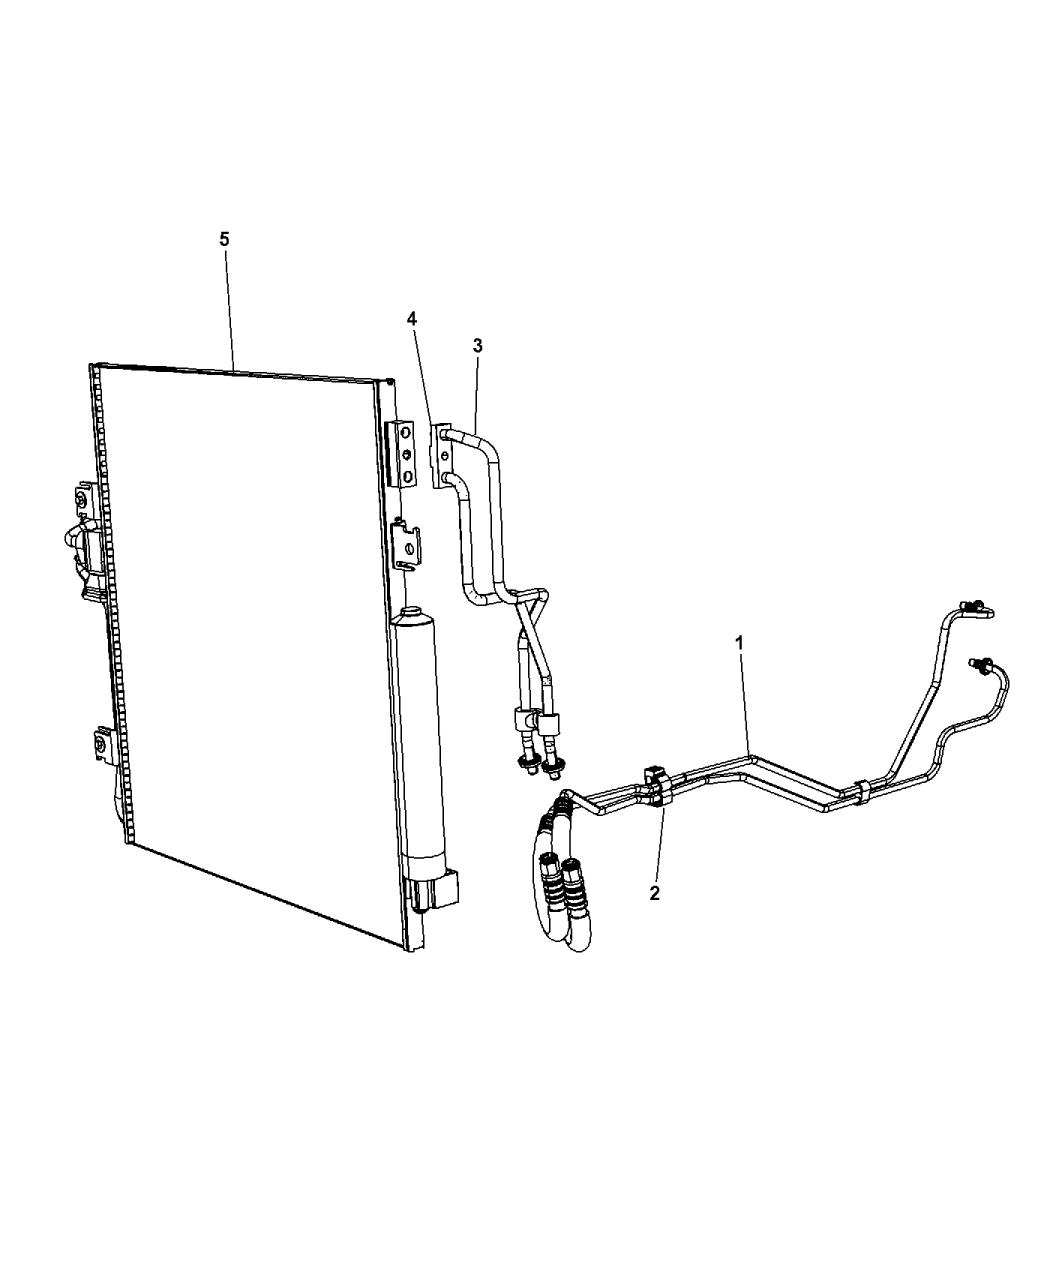 15c dodge nitro 4 0 engine diagram wiring resources 2013 dodge nitro dodge nitro 4 0 engine diagram #5